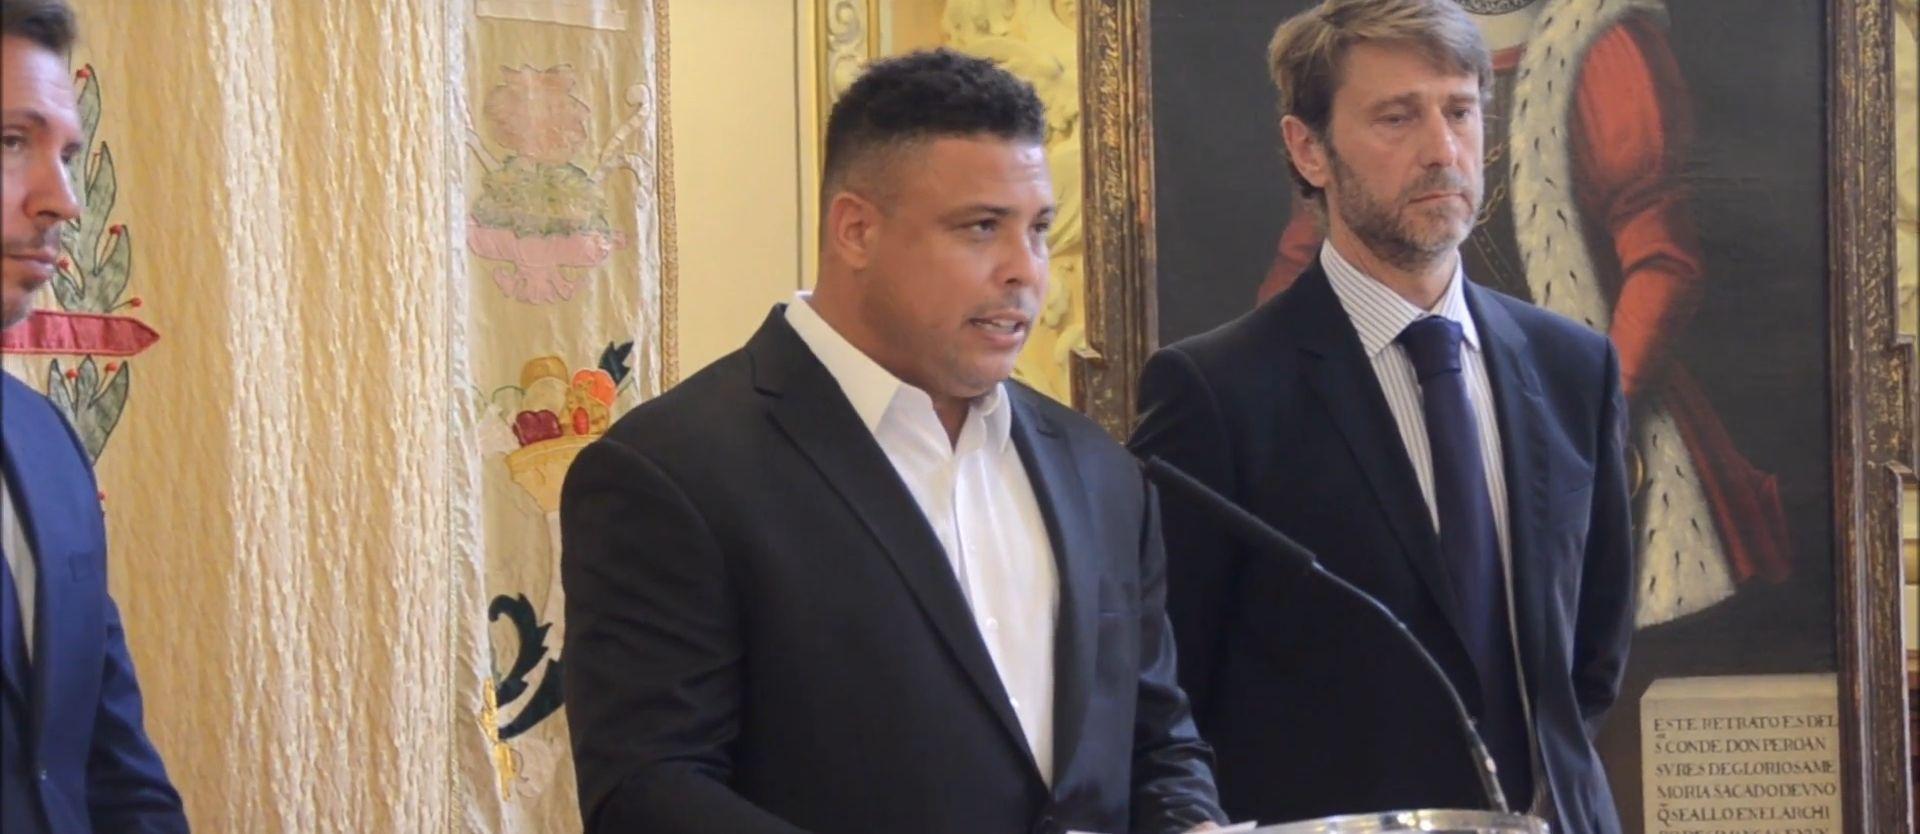 'Pravi' Ronaldo kupio Valladolid